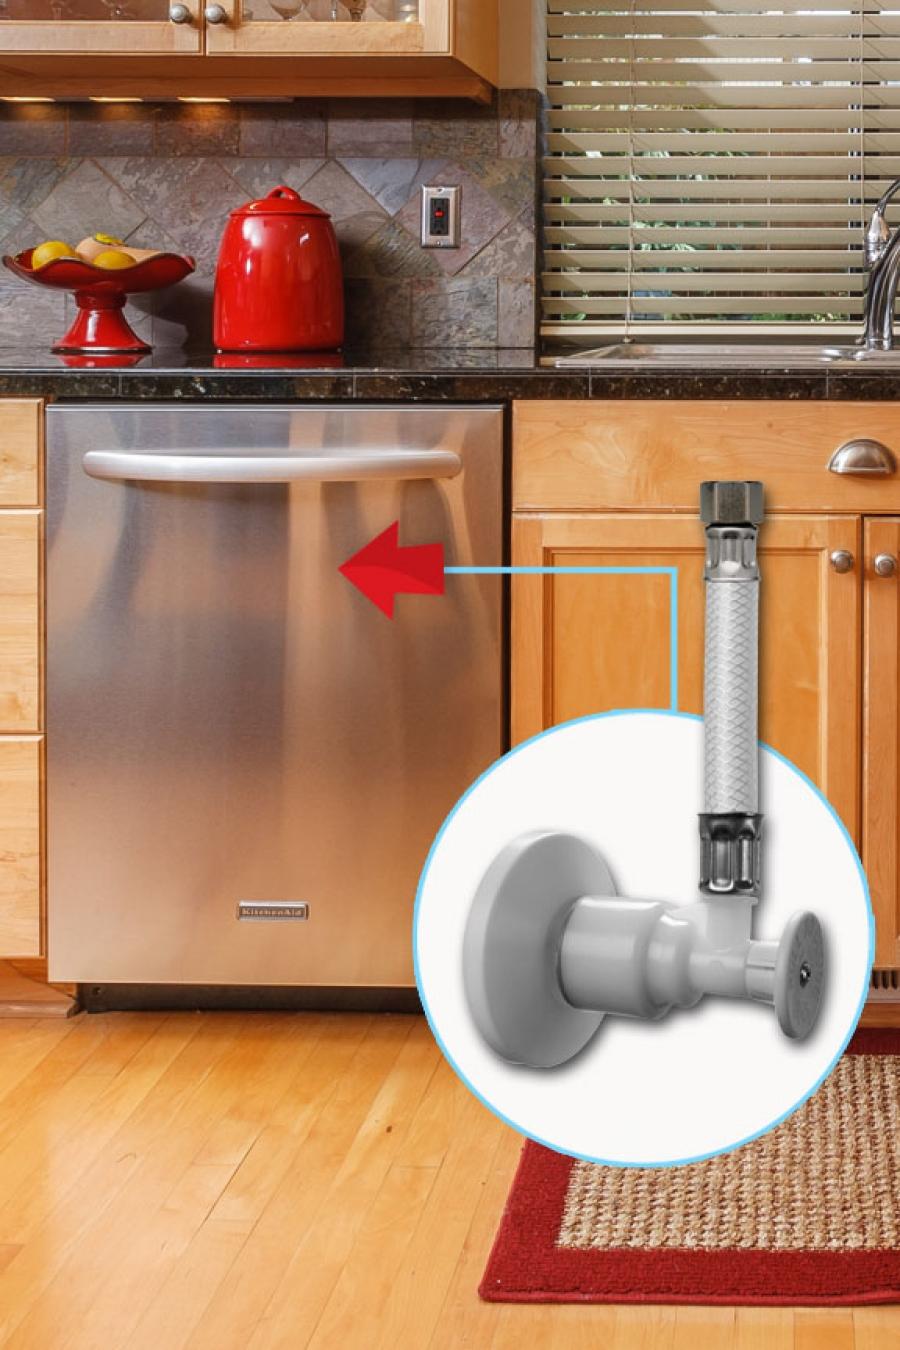 Dishwasher Supply Stop Valves